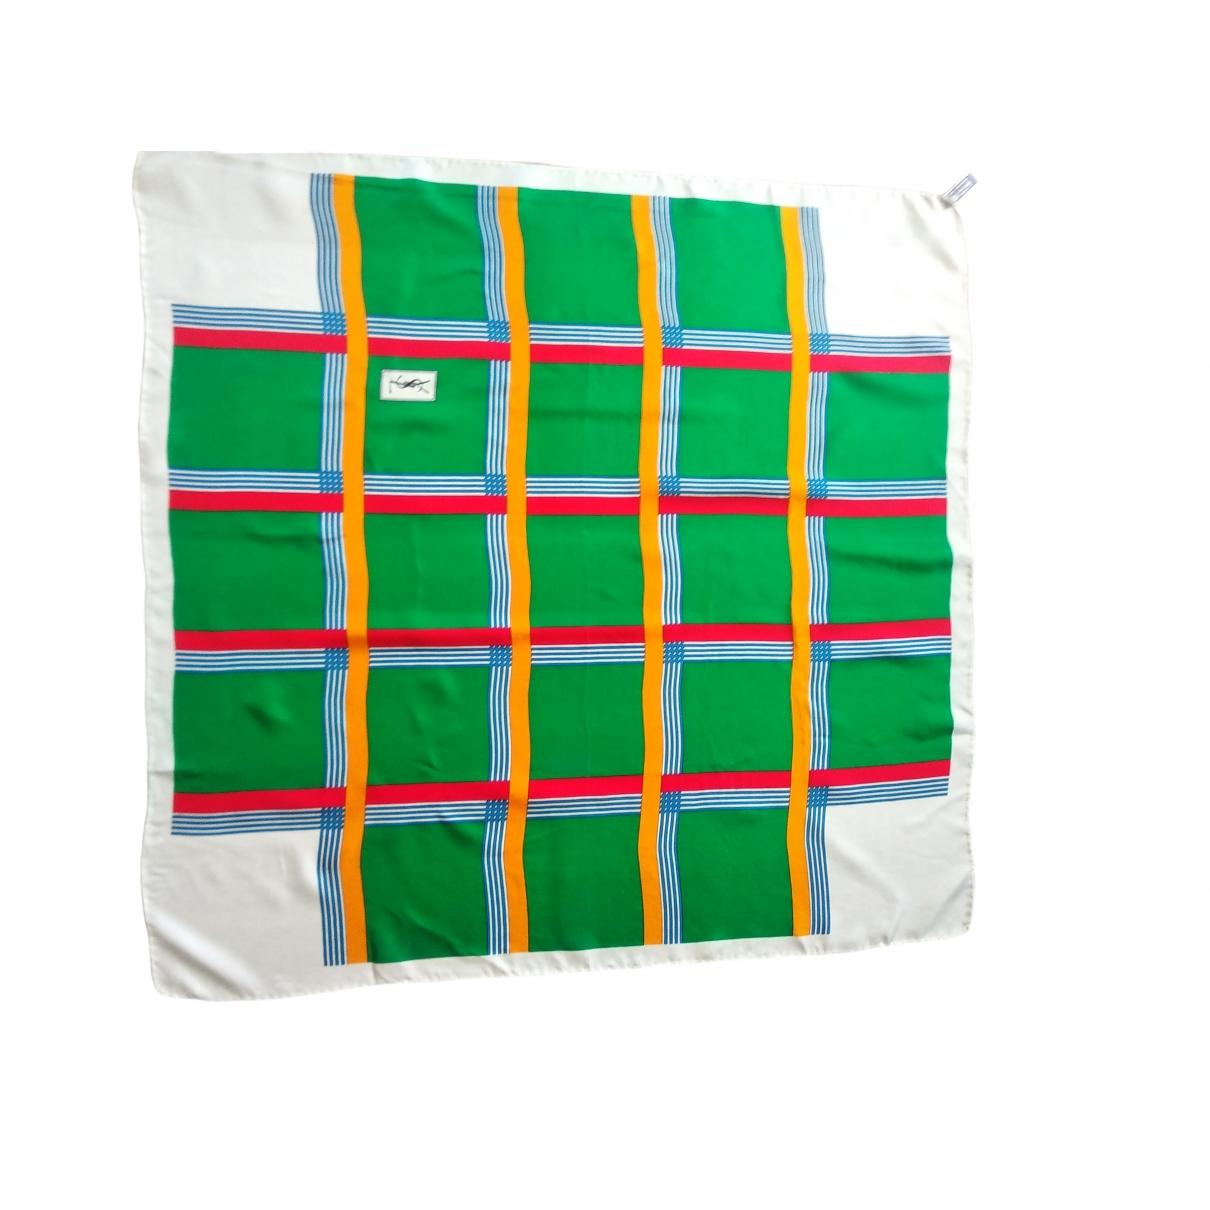 Yves Saint Laurent \N Green Silk scarf for Women \N